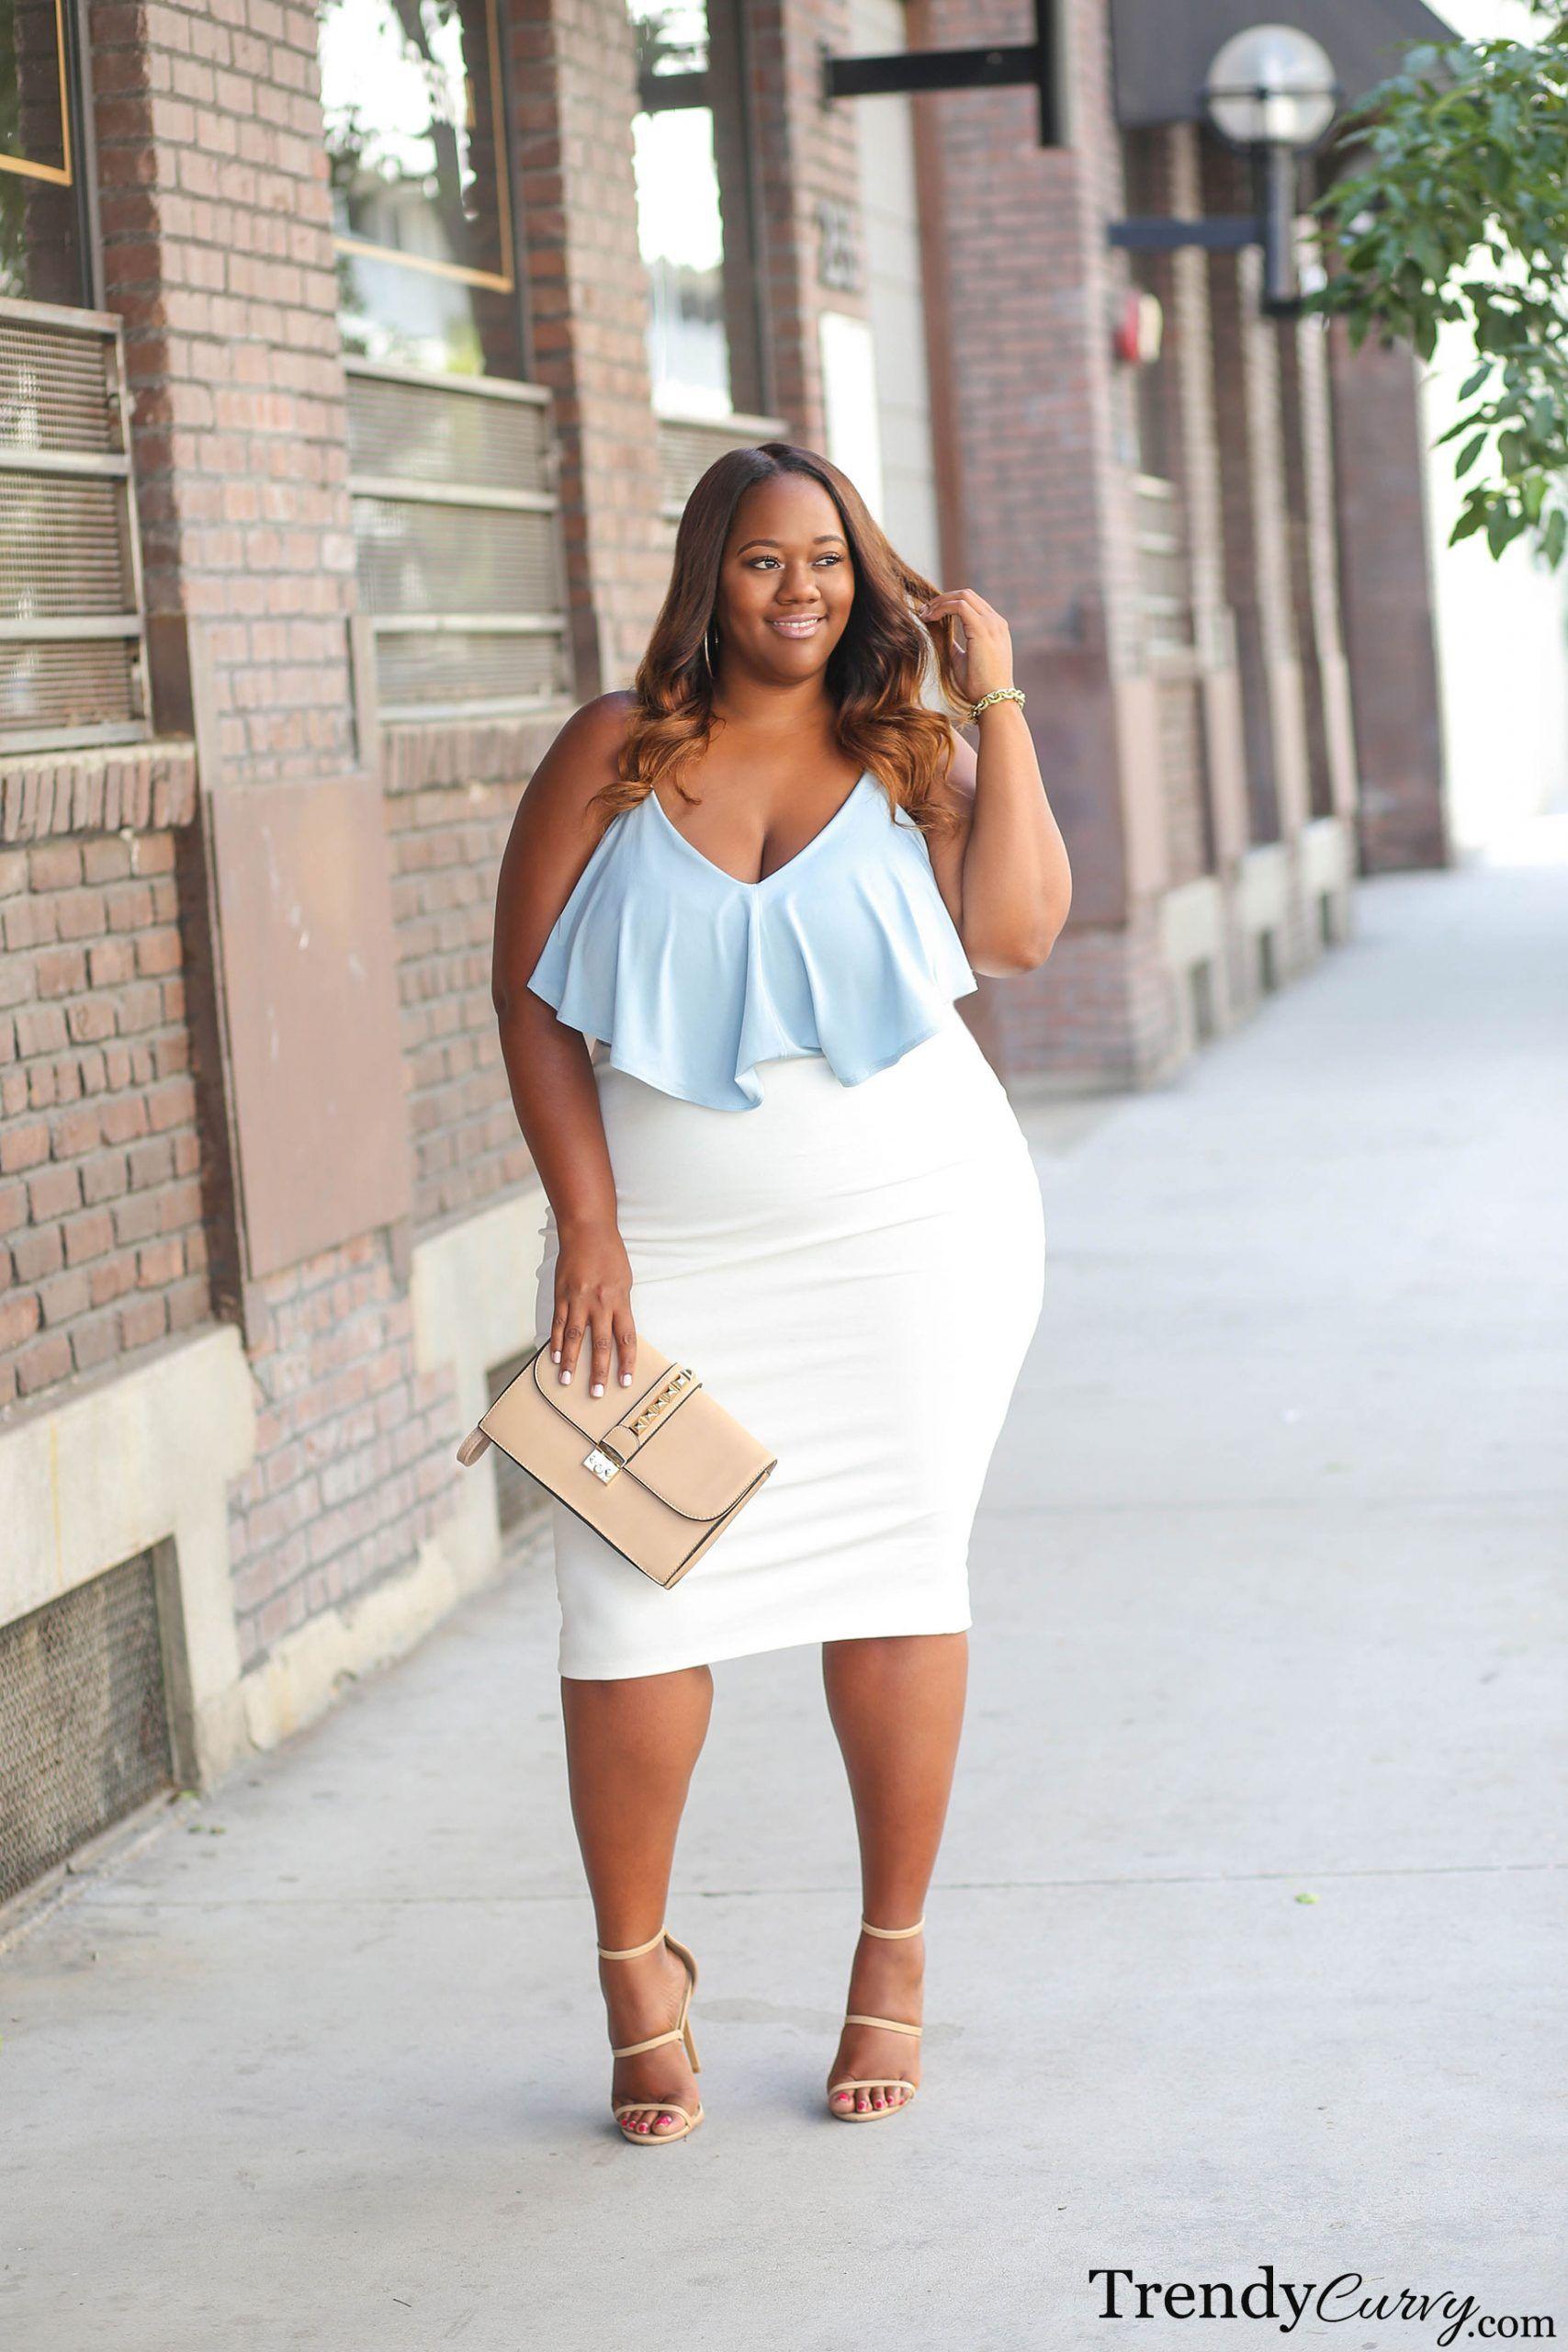 Summer Chic Trendy Curvy Flattering Plus Size Dresses Plus Size Fashion Plus Size Outfits [ 2560 x 1707 Pixel ]